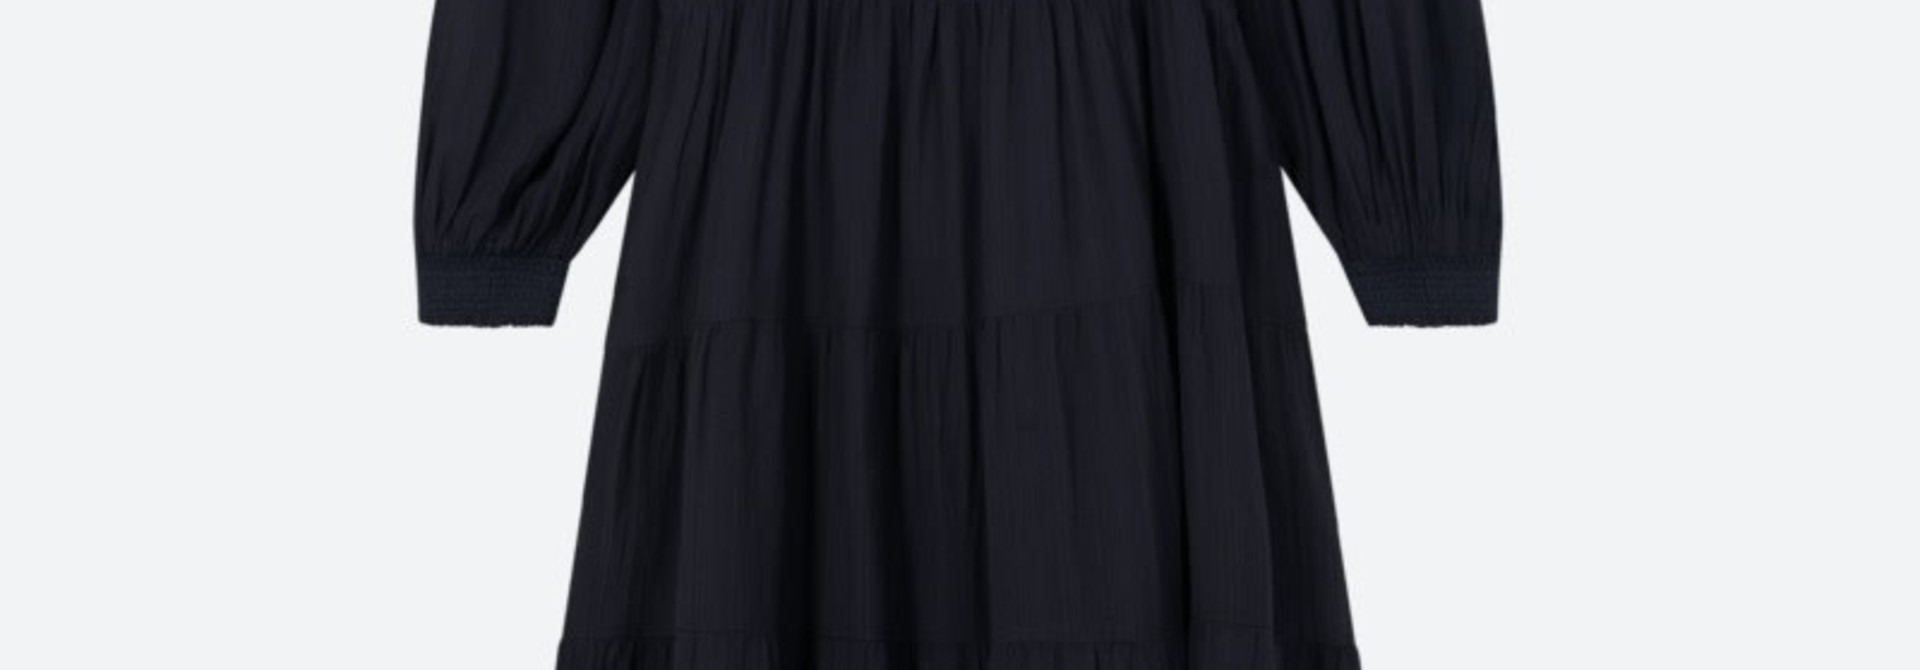 Sultane dress